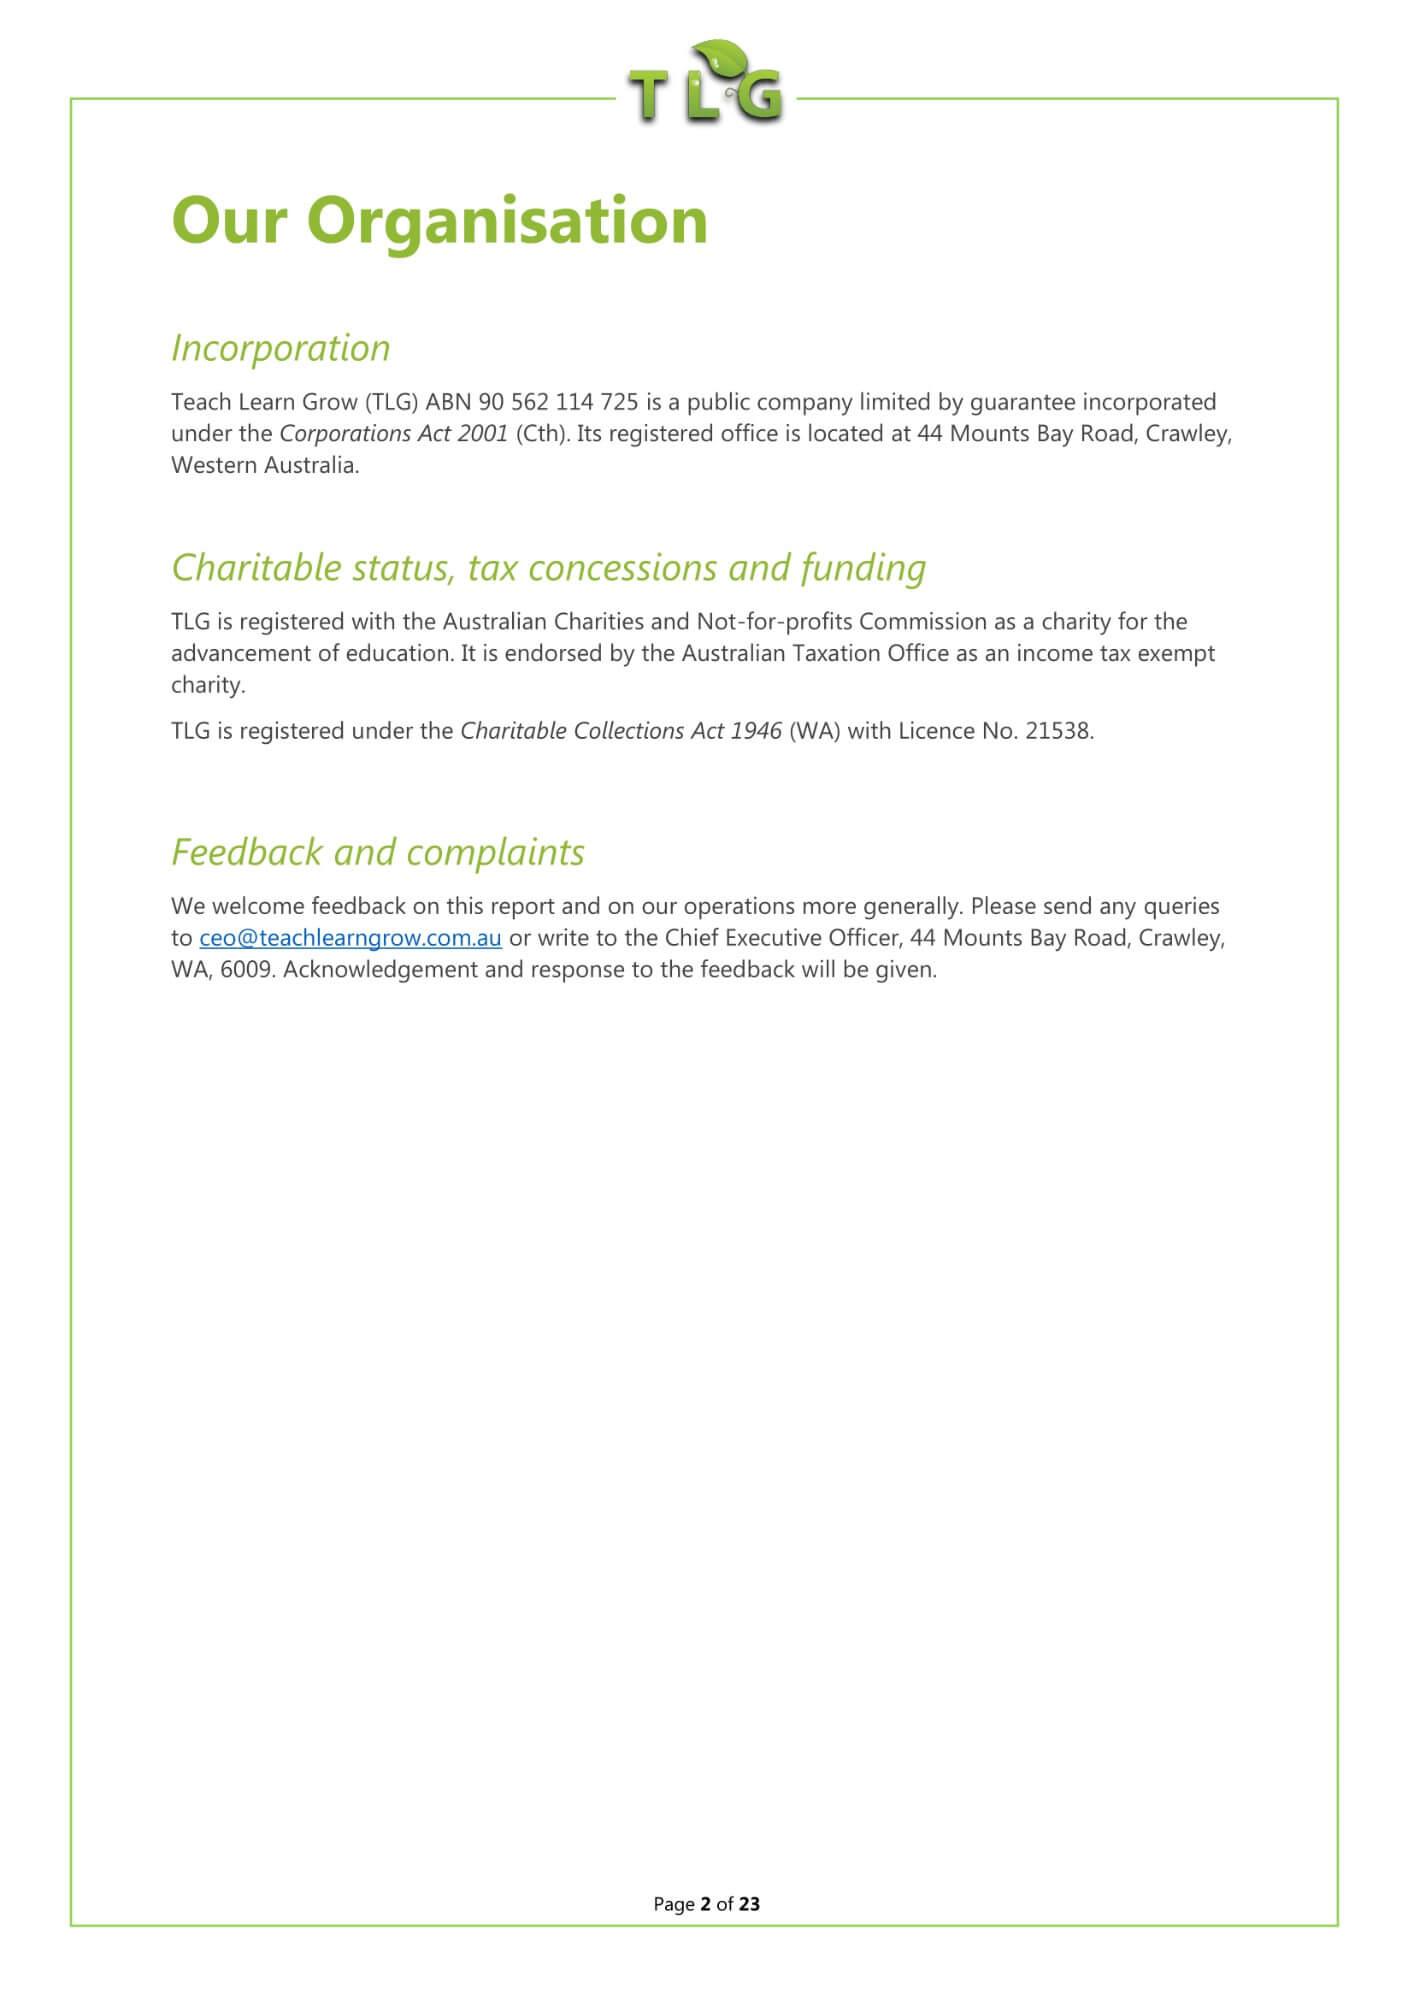 tlg-annual-report-FY13-02.jpg